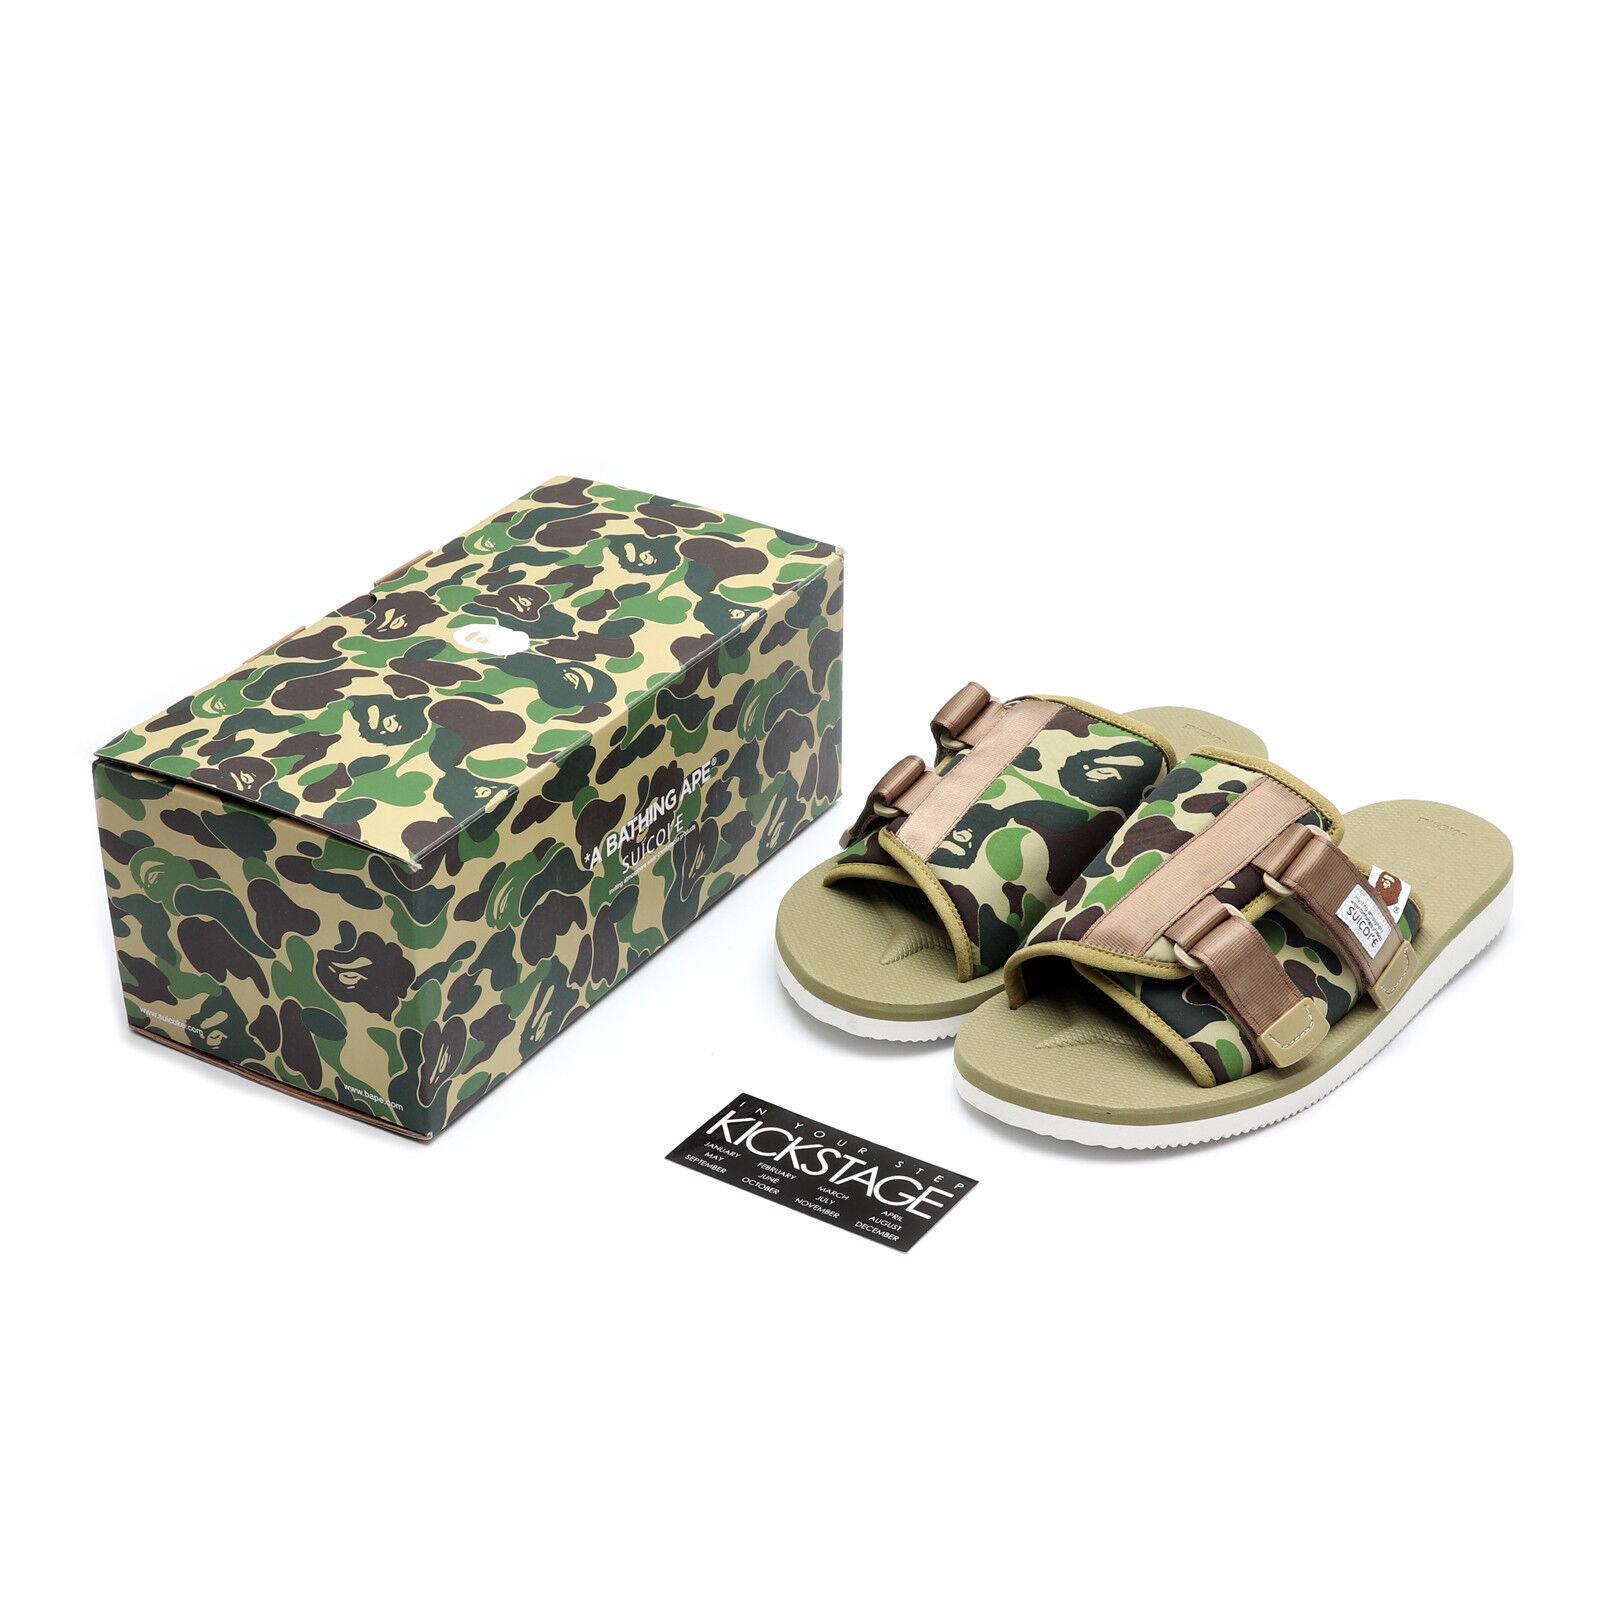 37af48461365 A Bathing APE x SUICOKE KAW-APE OG-081APE BAPE Olive Green Camo Sandals IN  HAND